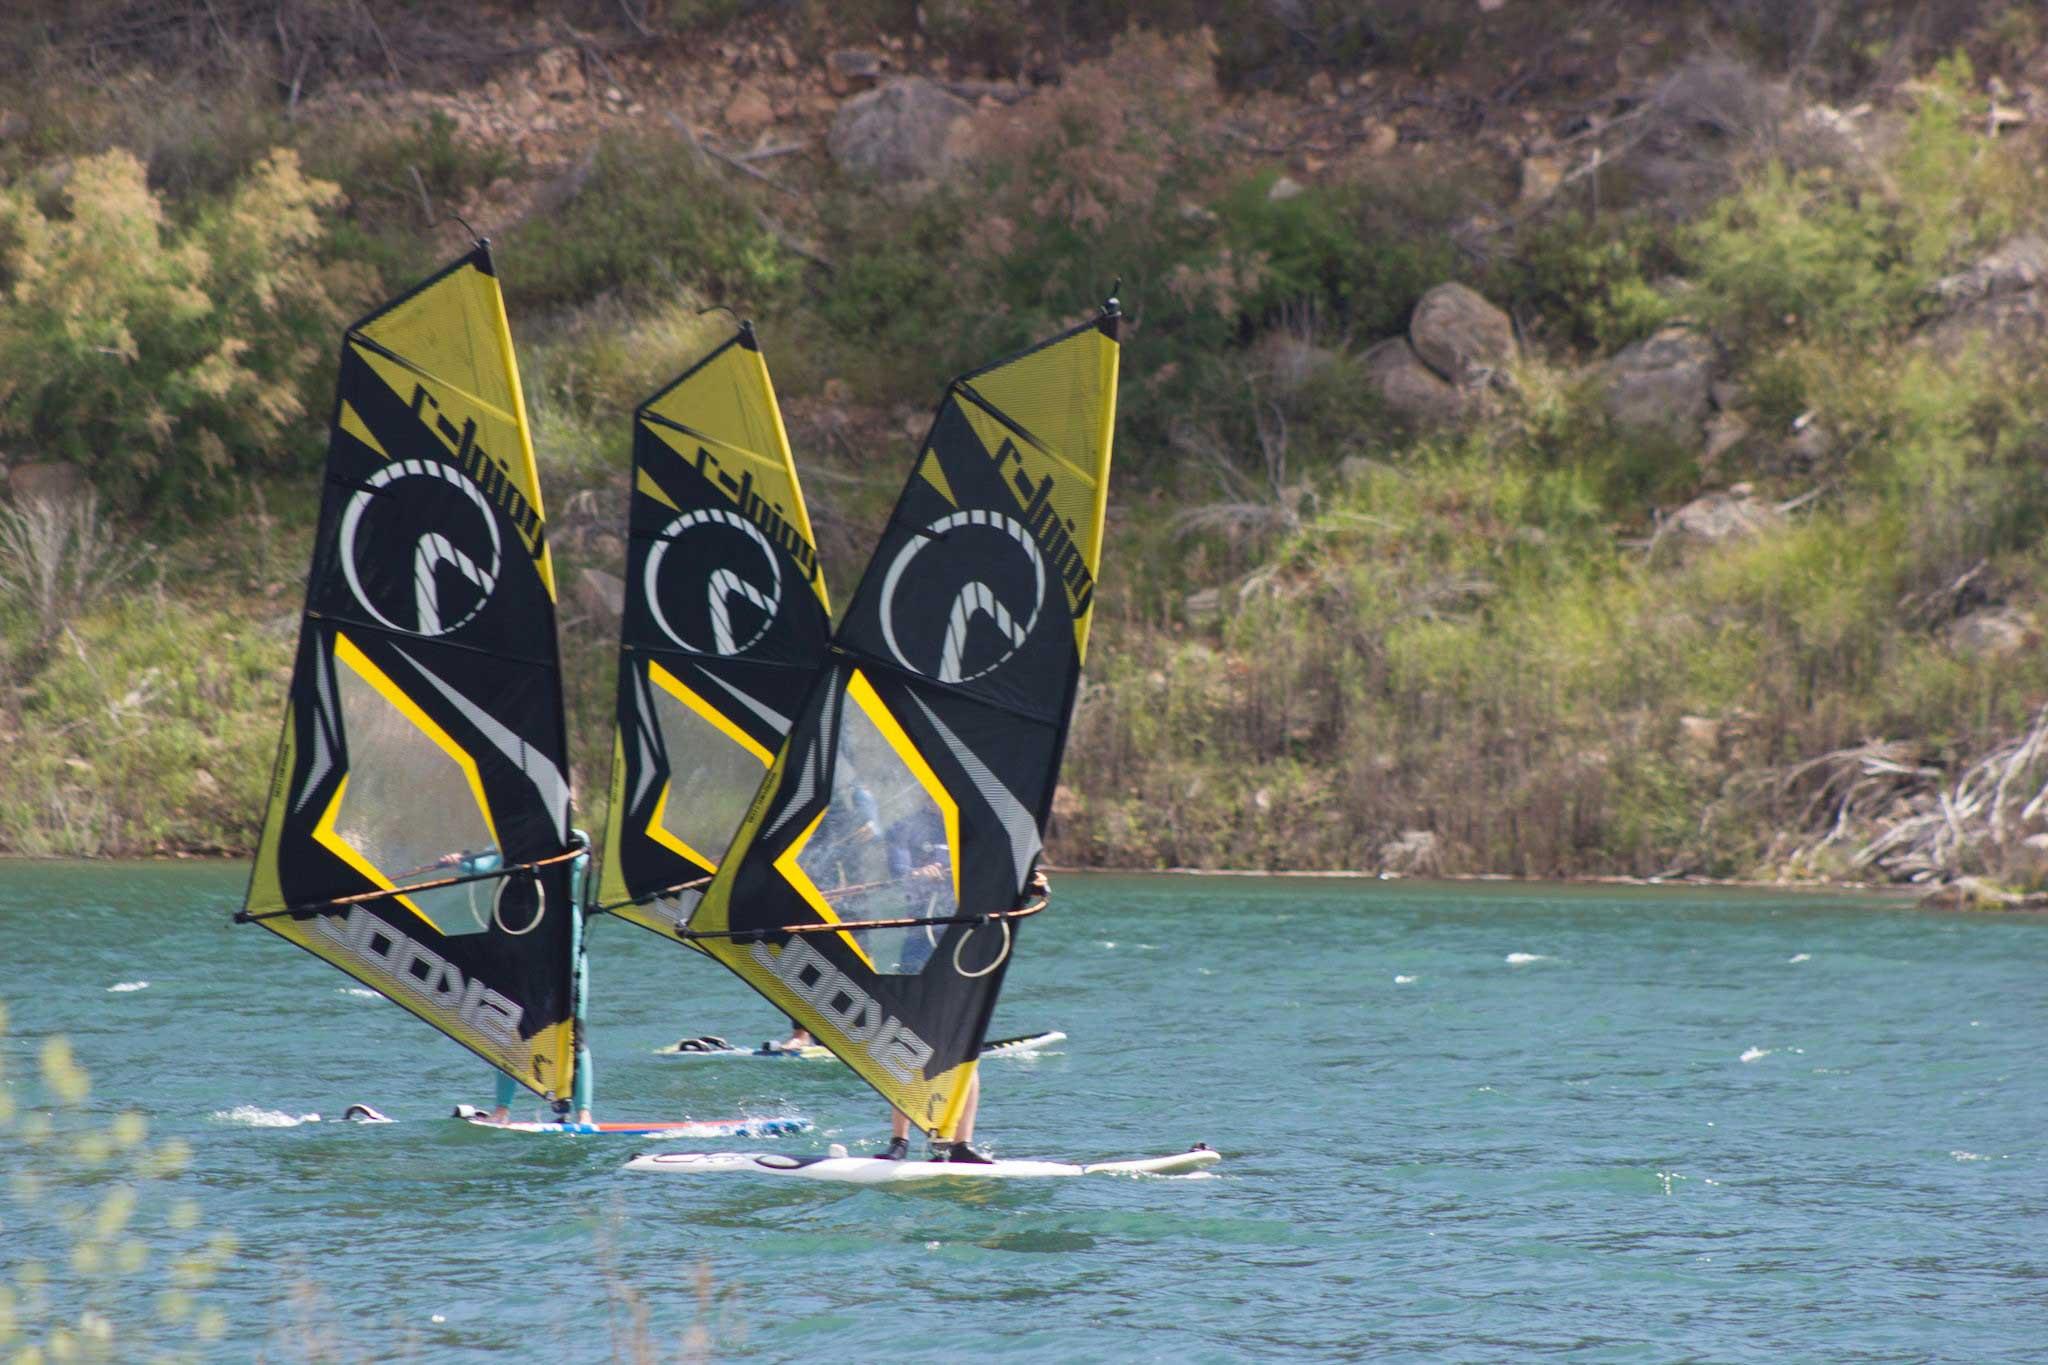 Vela Cu Rig Complet Petnru Windsurf Skool Easy Learning